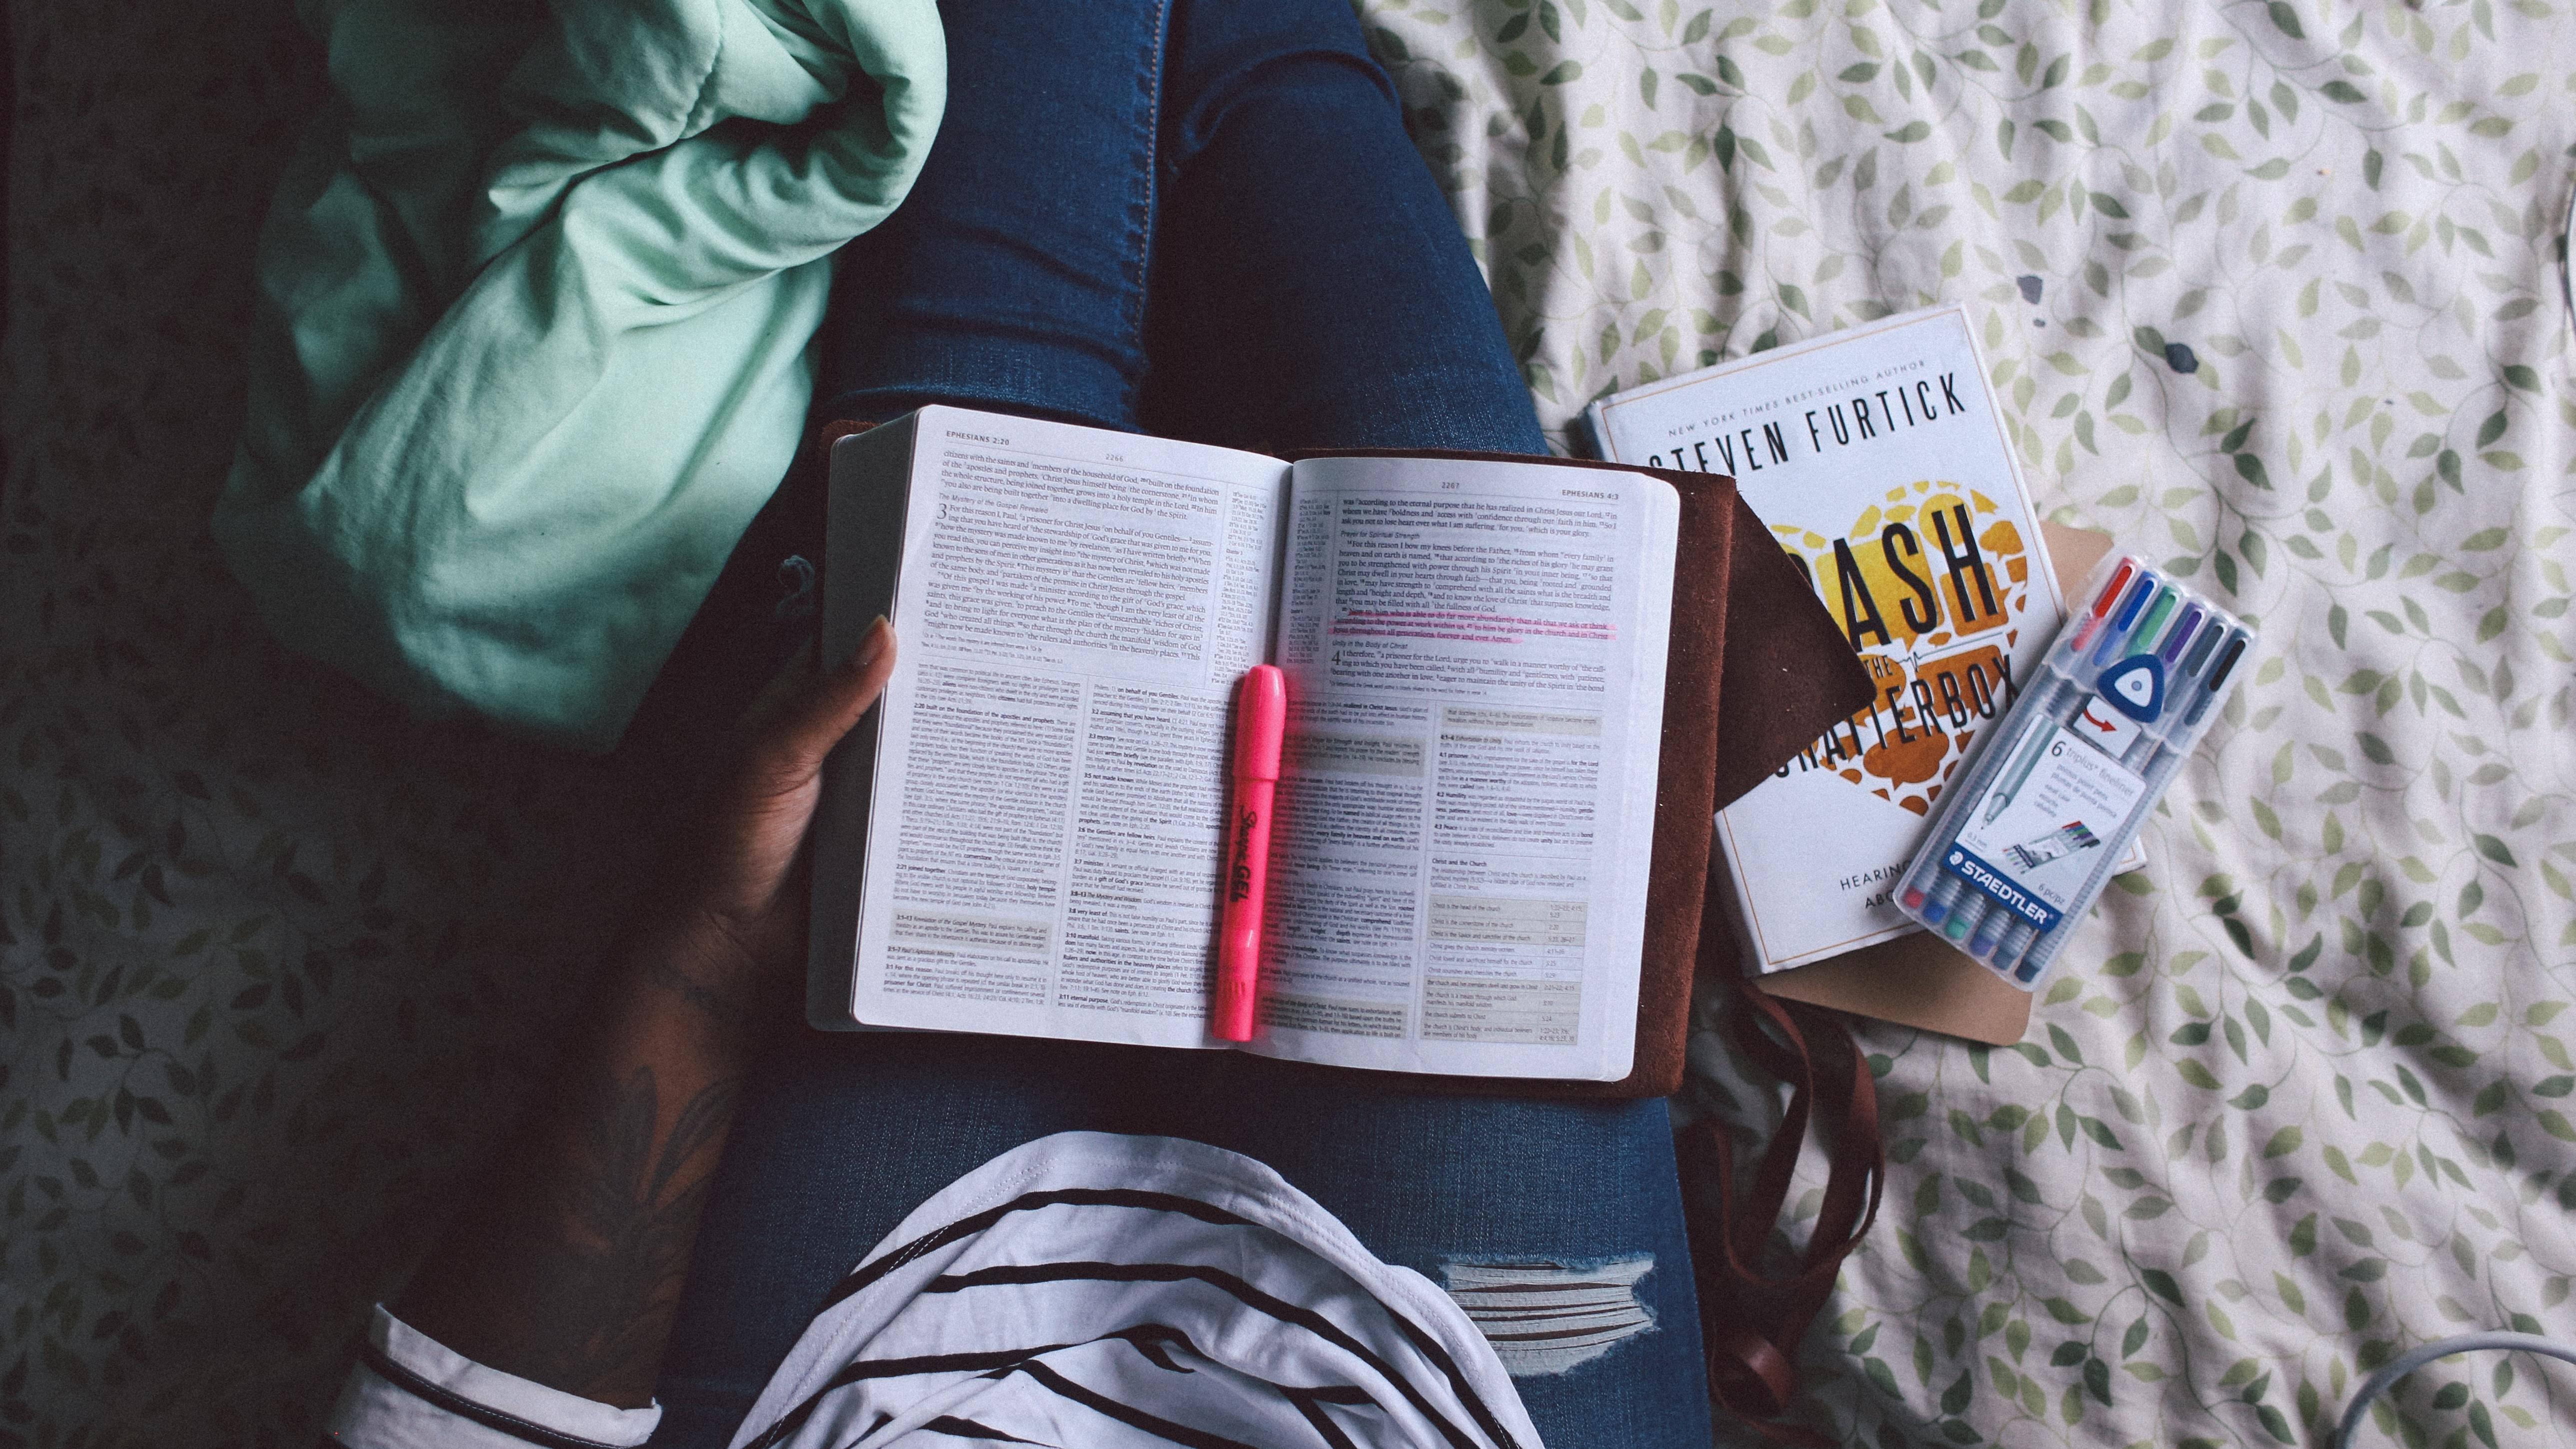 Kostenlose foto : Buch, Lesen, Frühling, Farbe, blau, Bibel, Hinweis ...